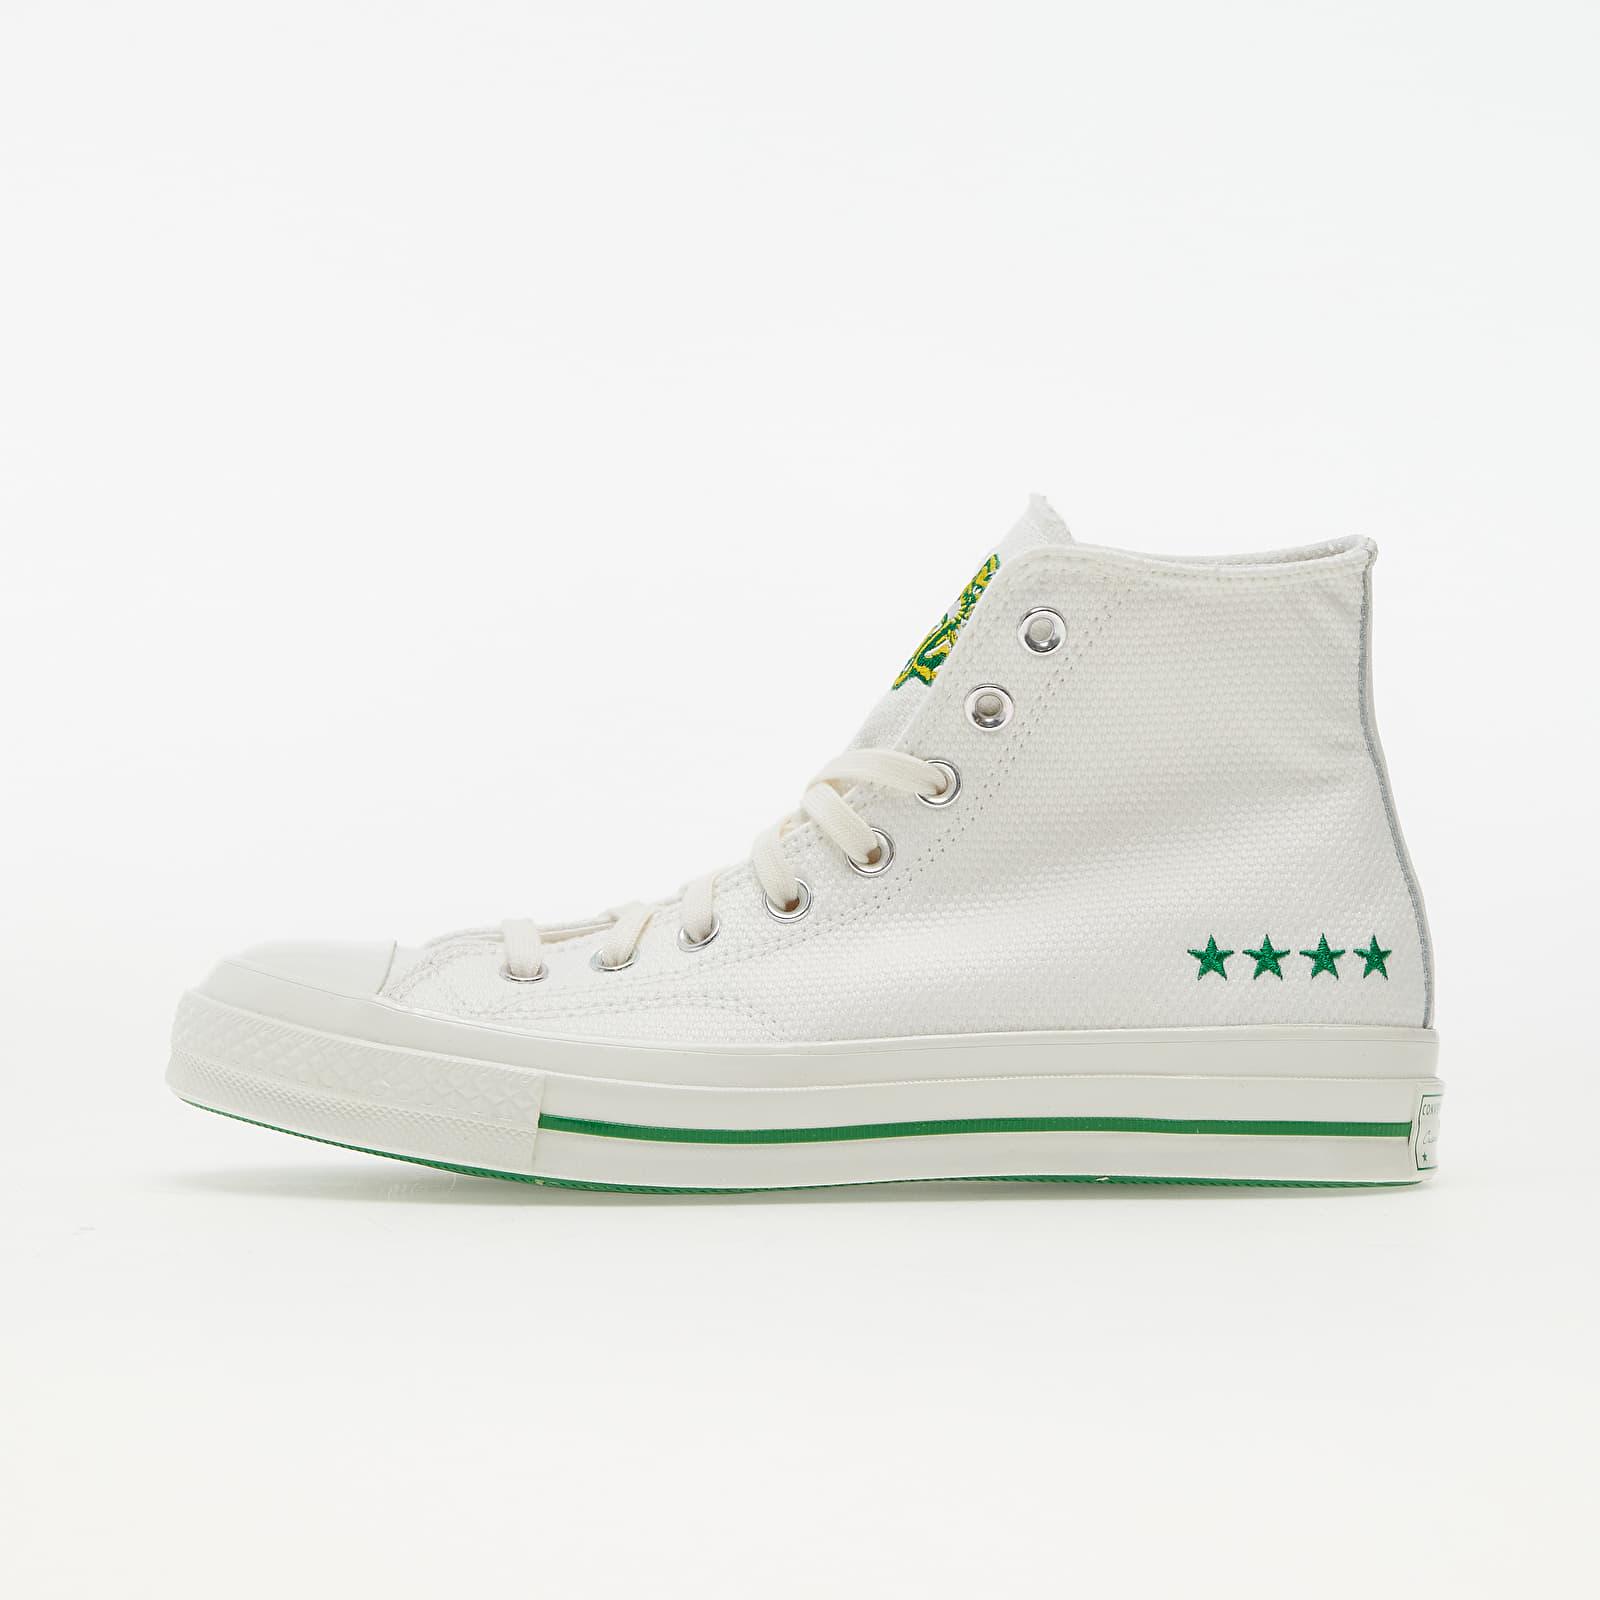 Converse Chuck 70 Vintage White/ Green/ Amarillo 170153C